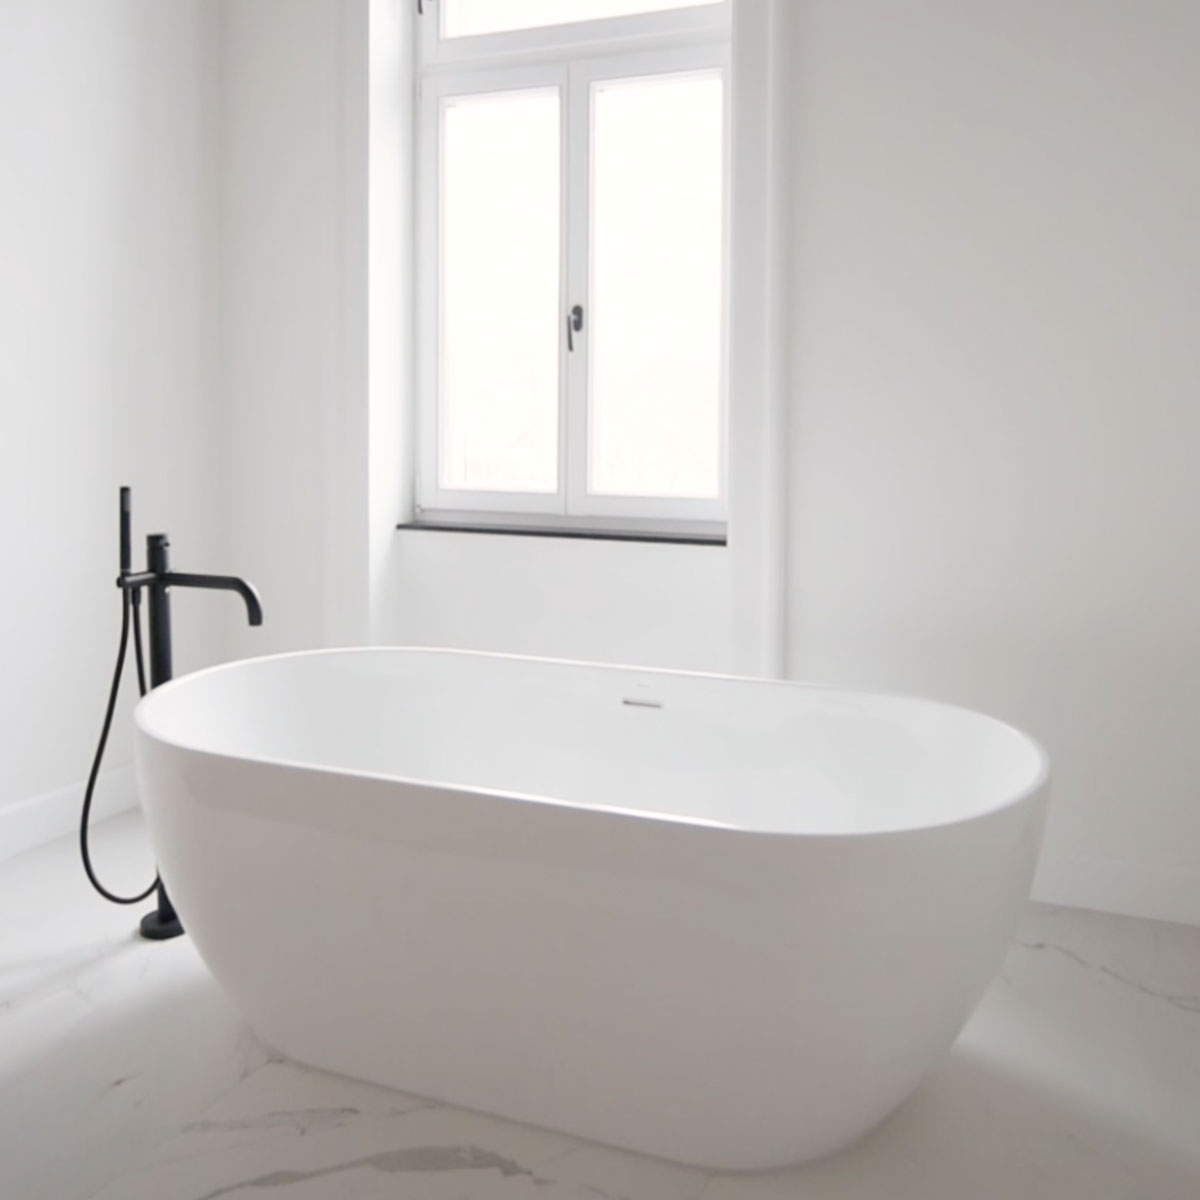 1-D-Bathtubs